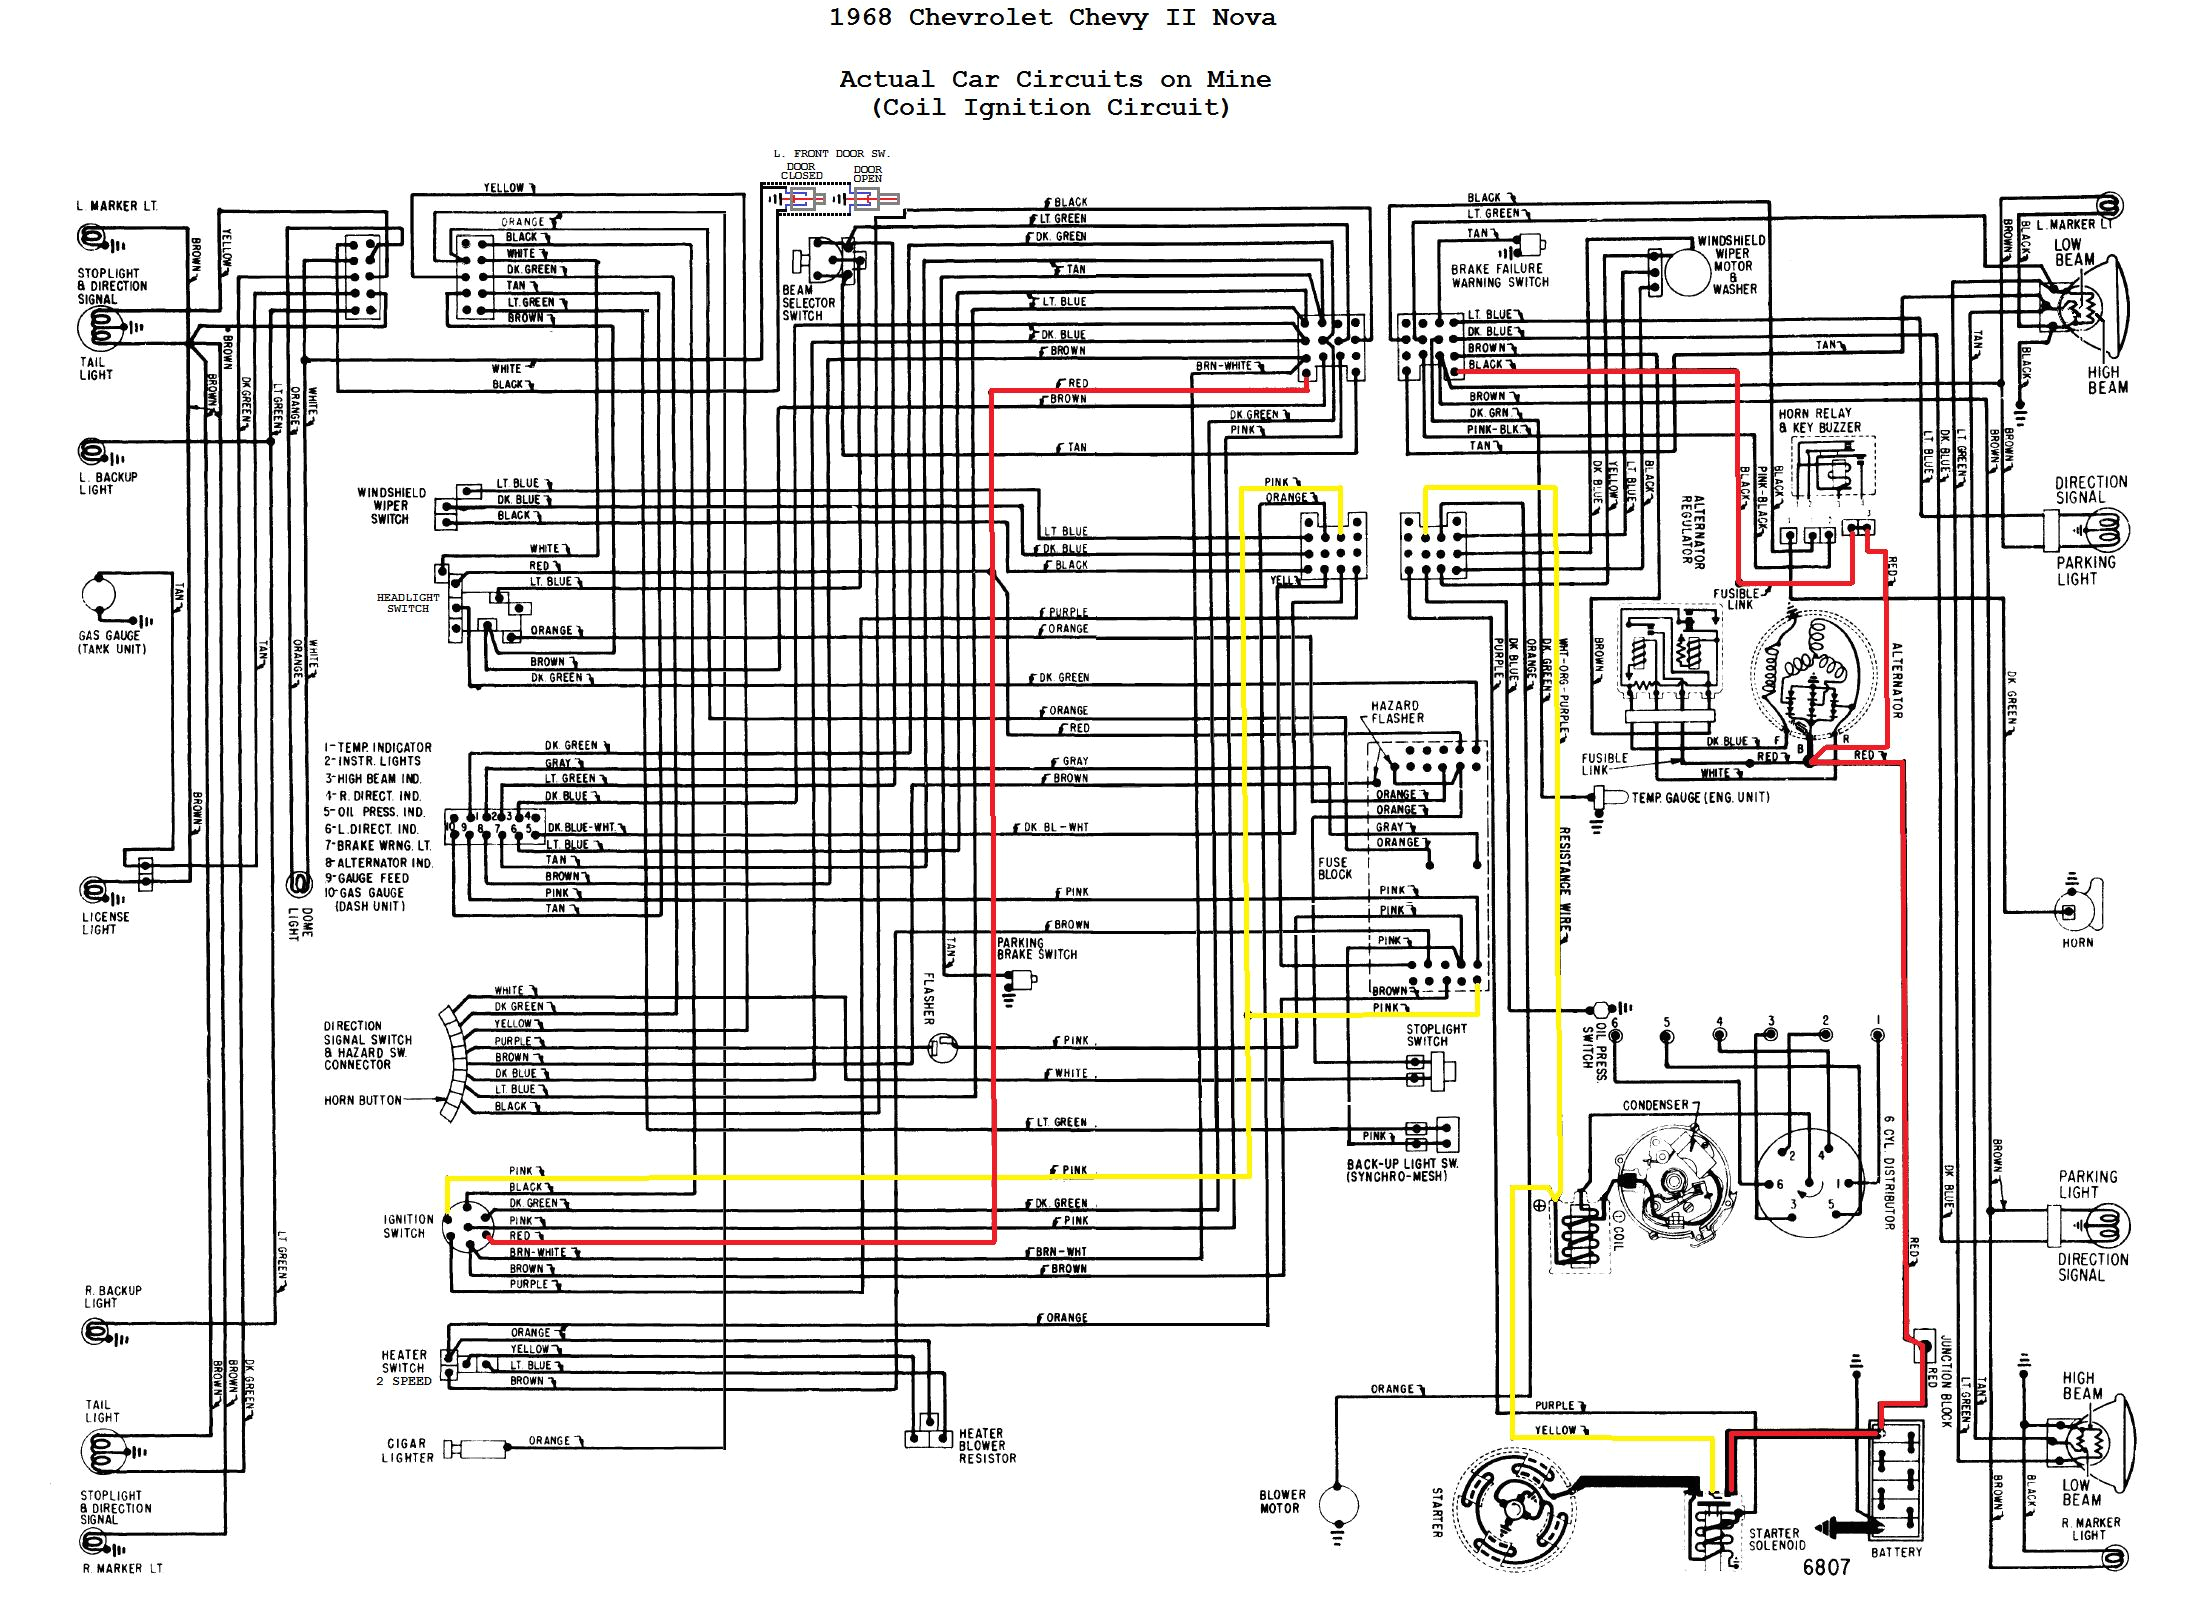 1968 chevrolet nova wiring diagram each circuit highlighted 23 jpg